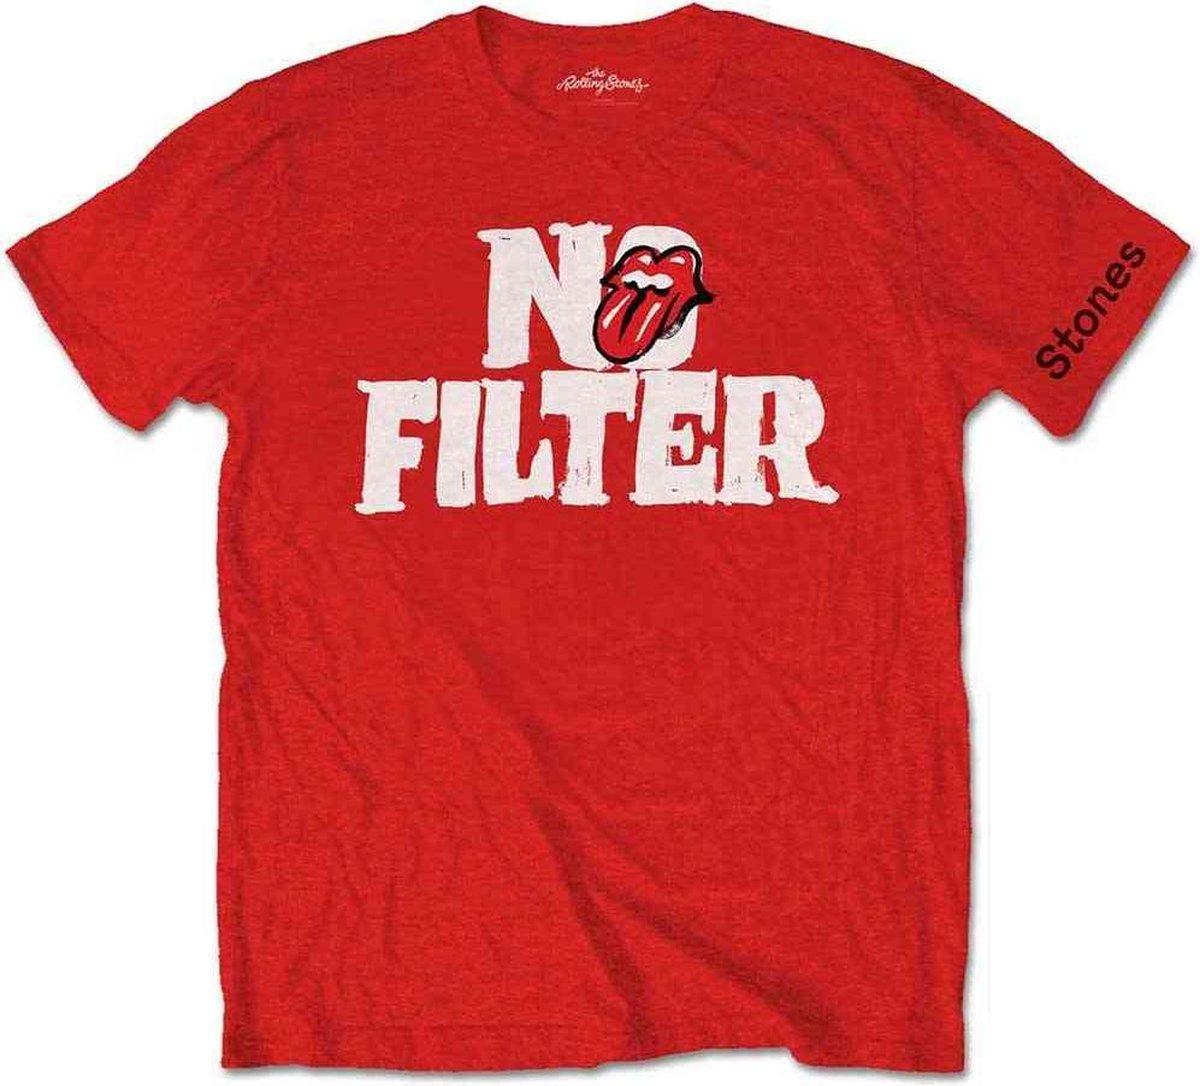 Rolling Stones Heren Tshirt -M- No Filter Header Logo Rood